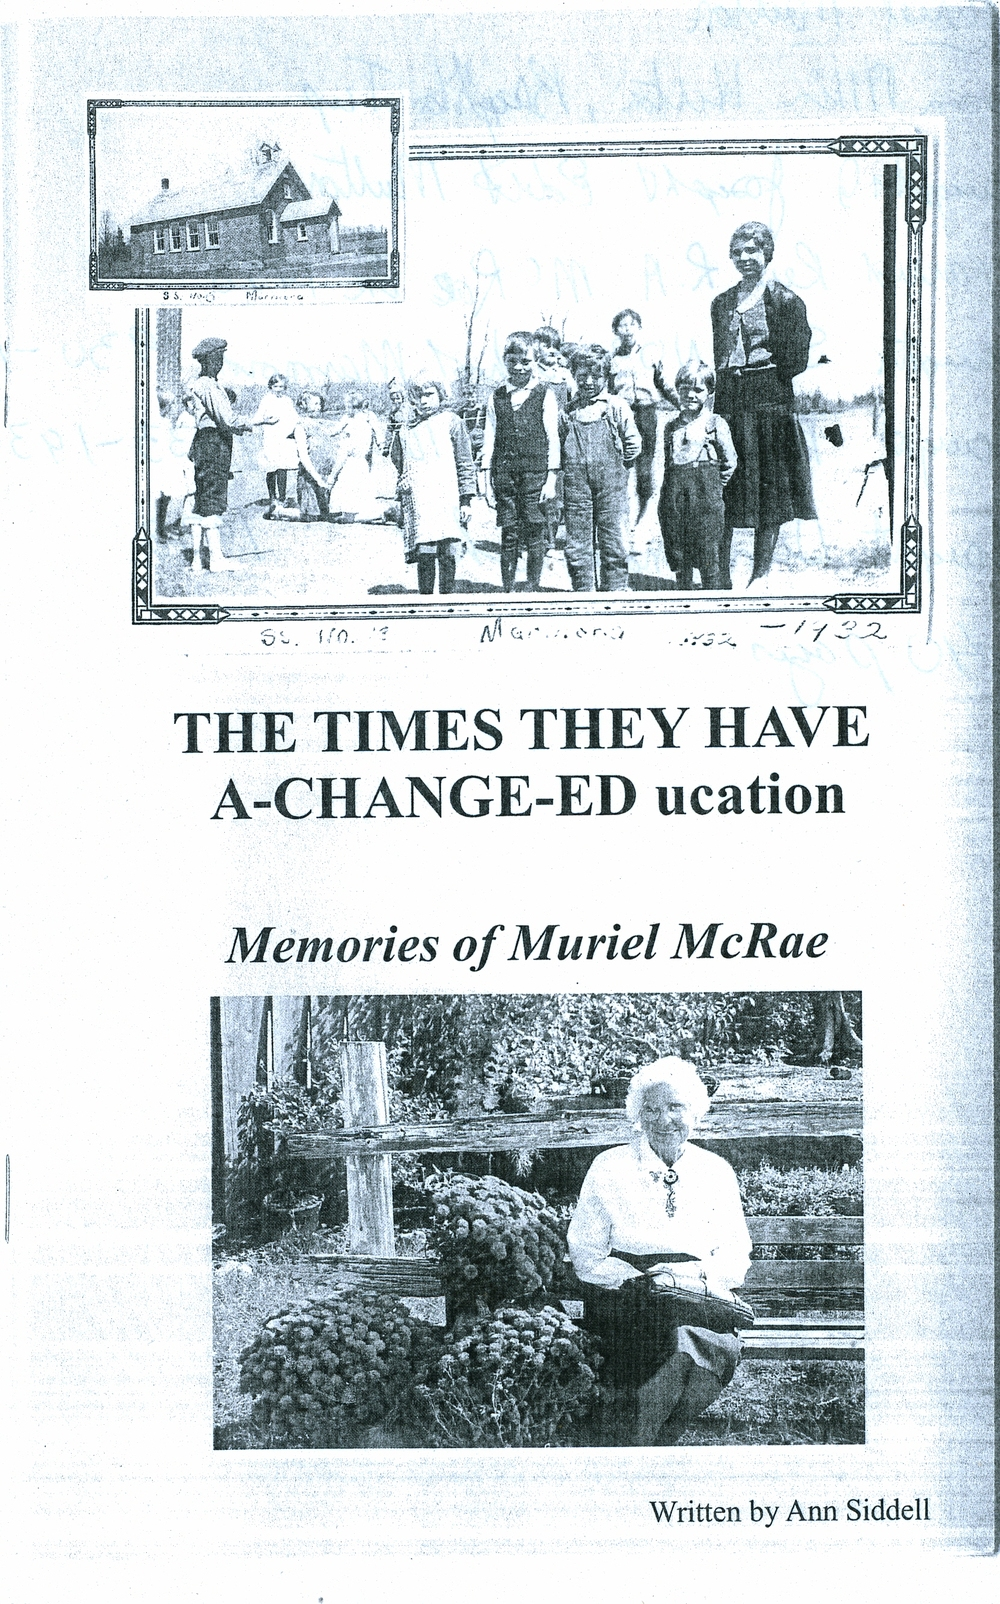 Muriel McRae